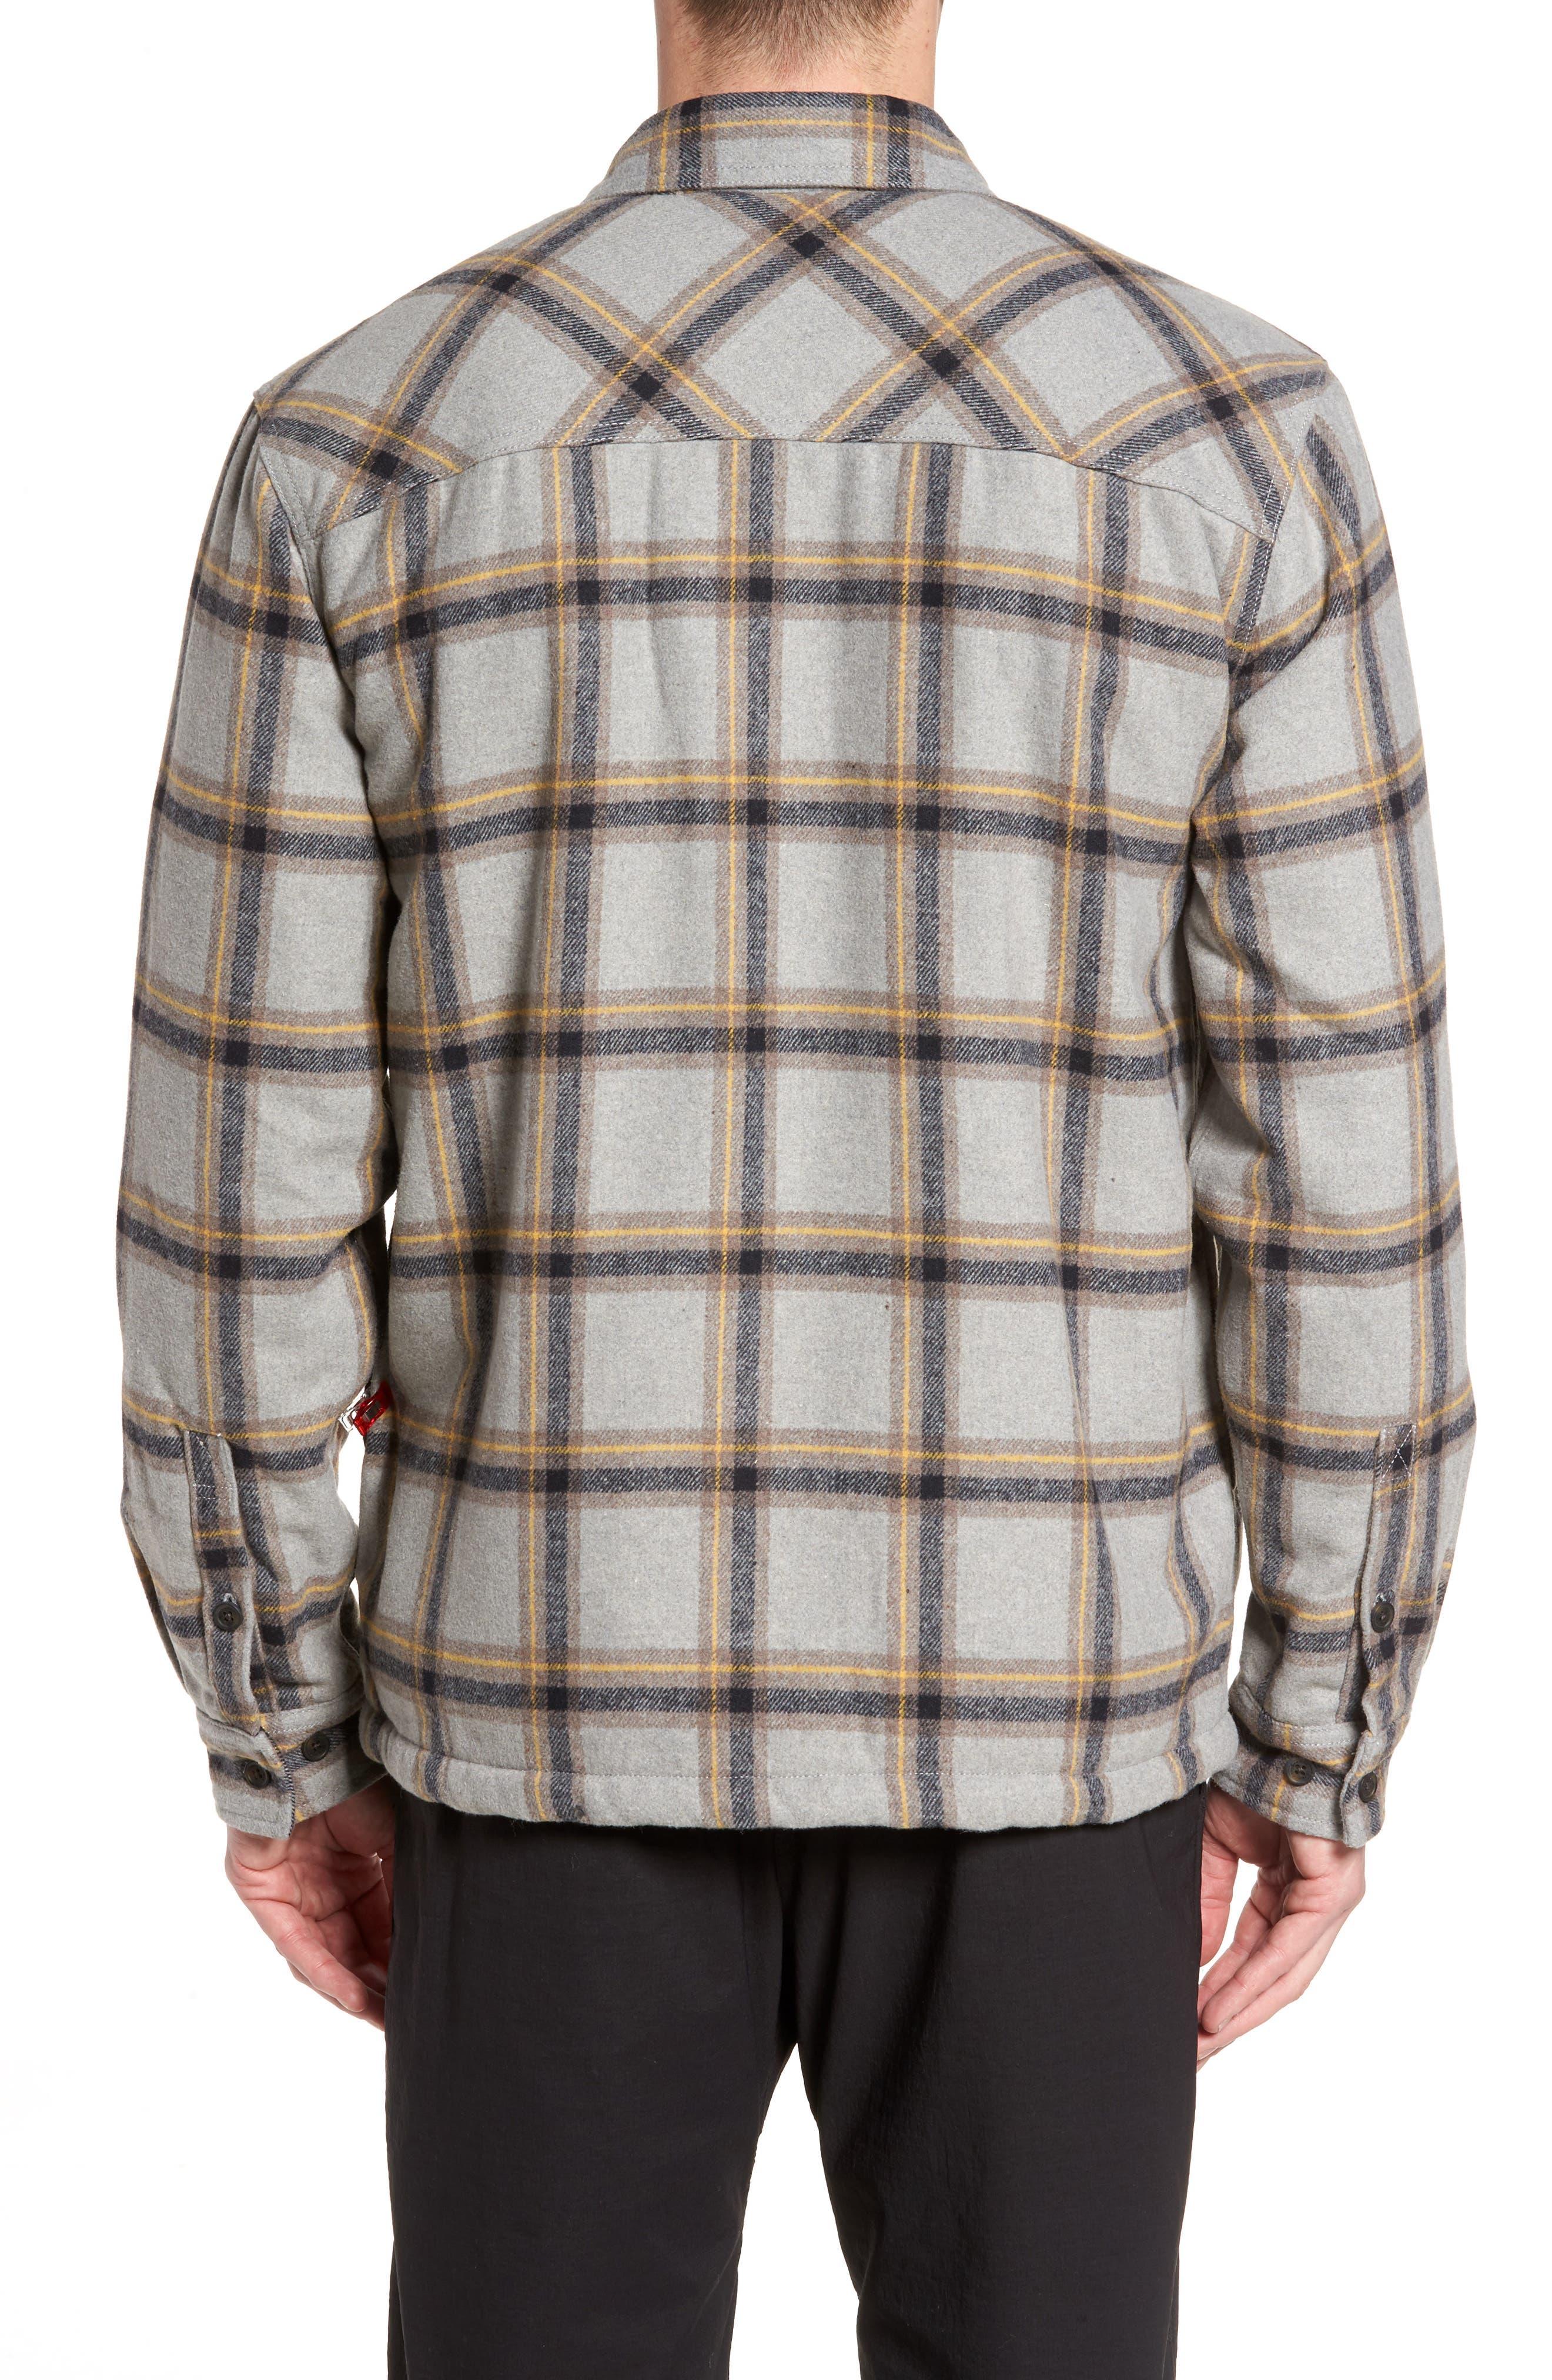 Tough Guy Plush Lined Flannel Shirt Jacket,                             Alternate thumbnail 2, color,                             020